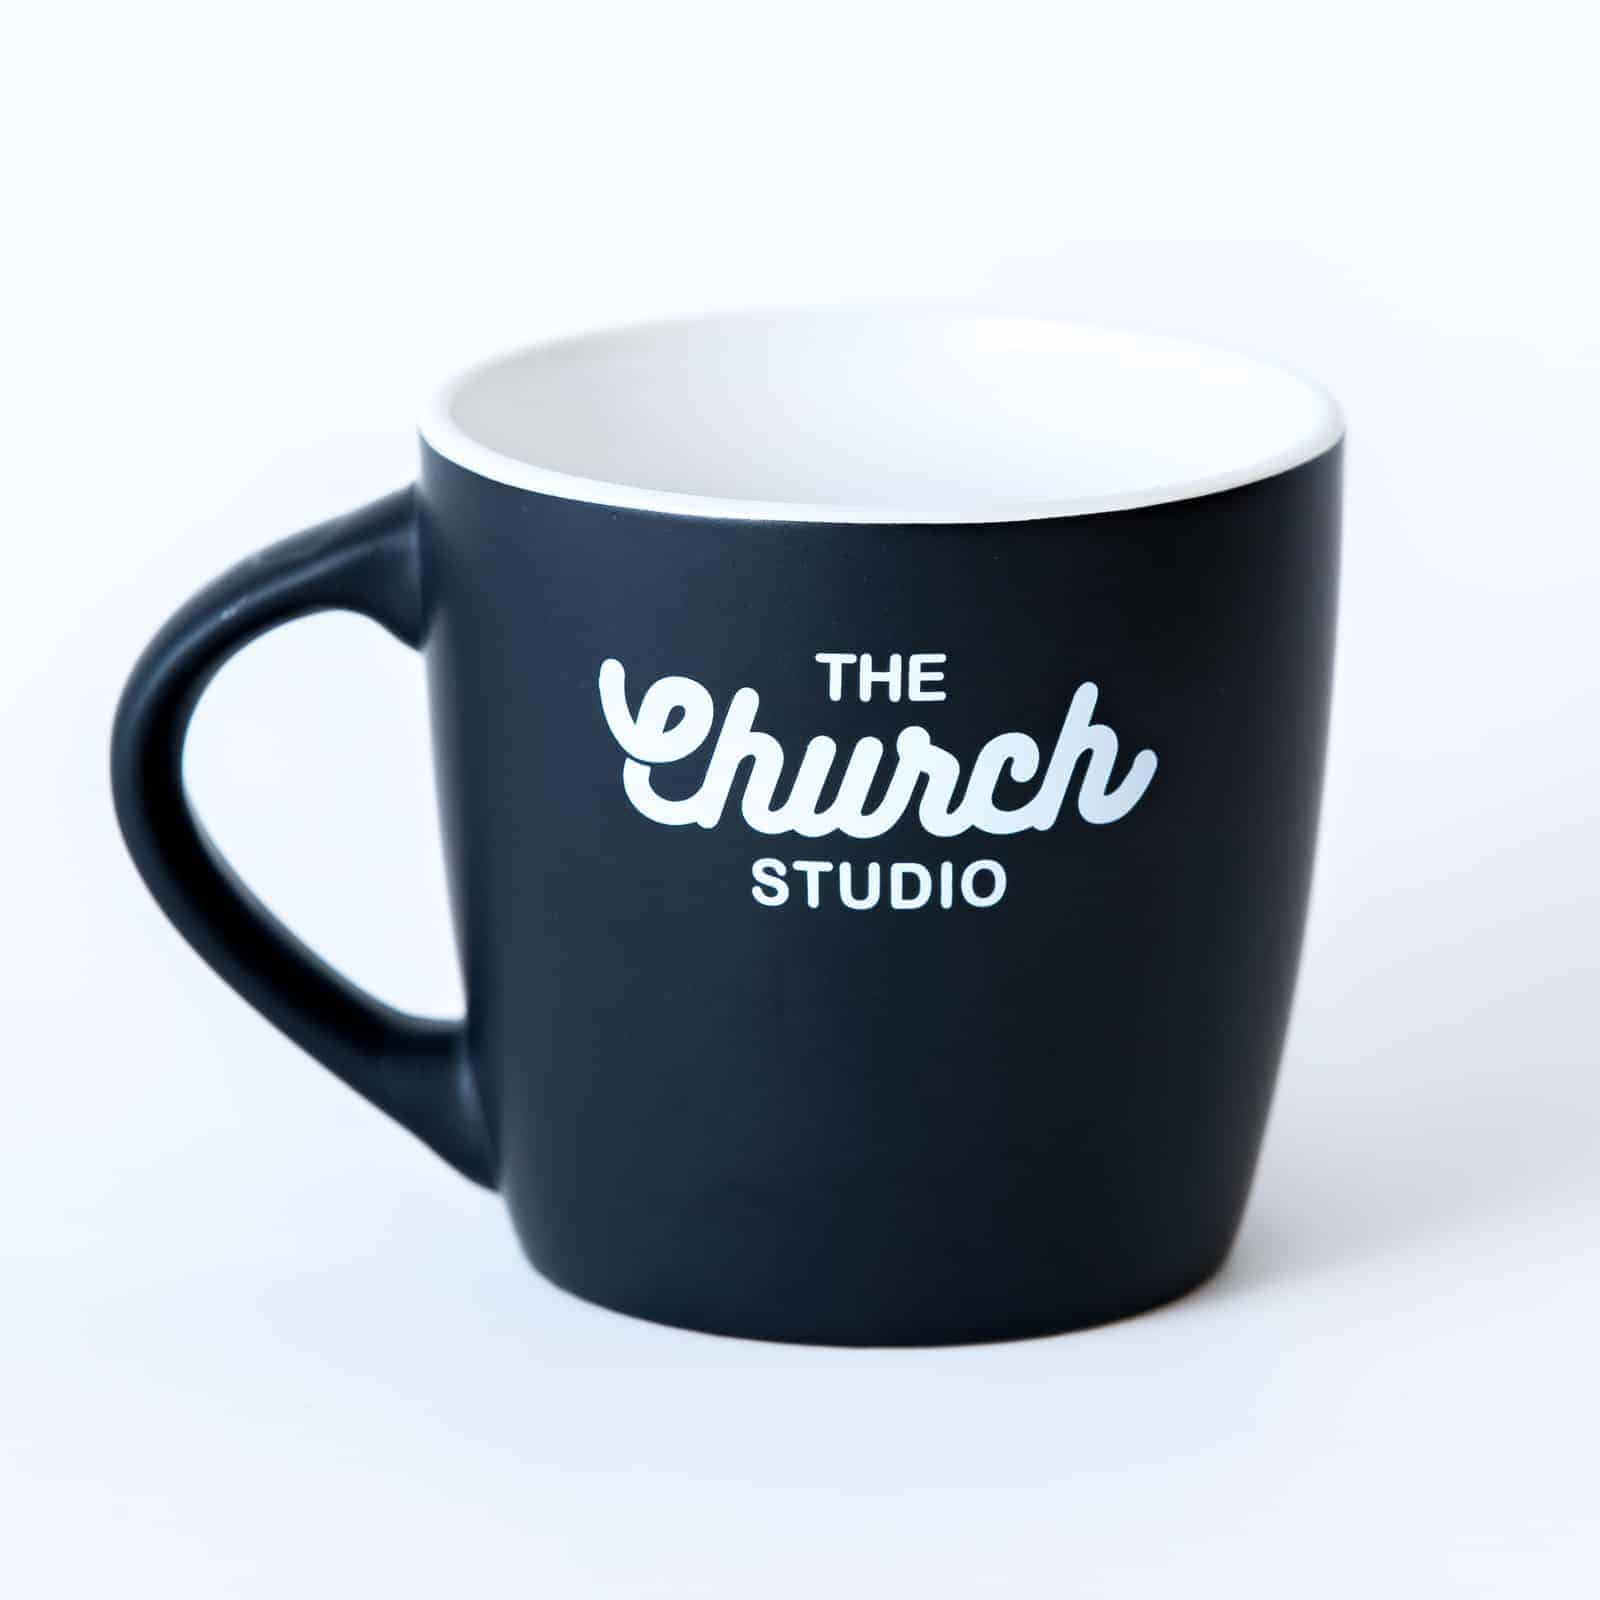 Ceramic Mug 10 Oz The Church Studio